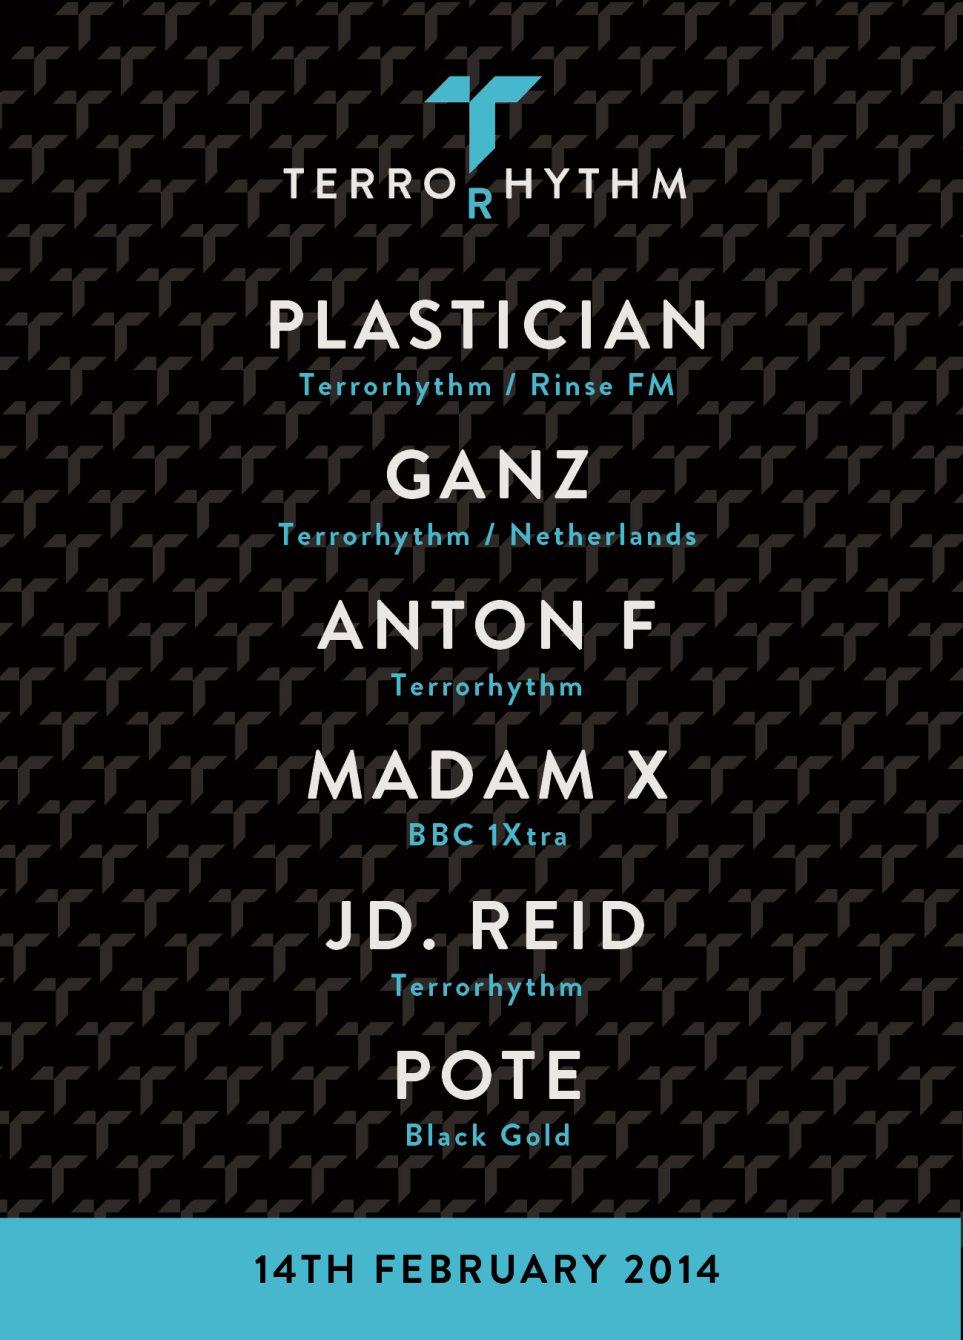 Terrorhythm at Plan B Basement with Plastician, Ganz, Anton F, Madam X, JD. Reid & Pote - Flyer front